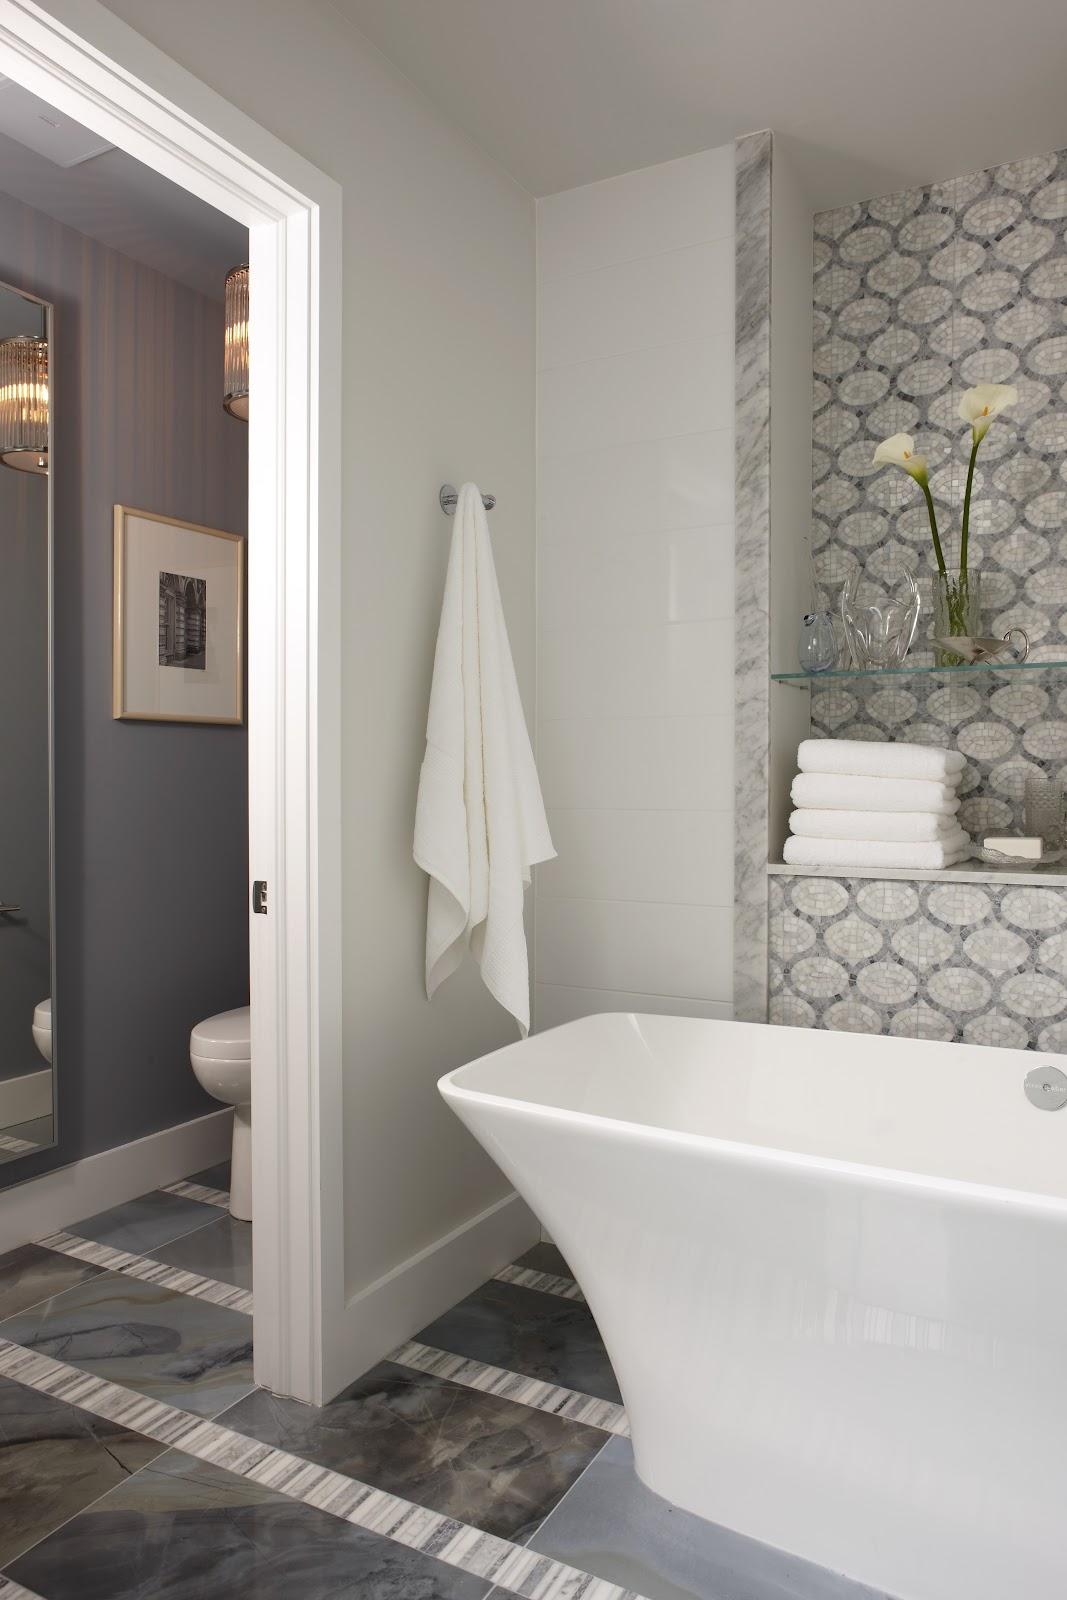 The Tile Shop: Design By Kirsty: New Sarah Richardson Bath